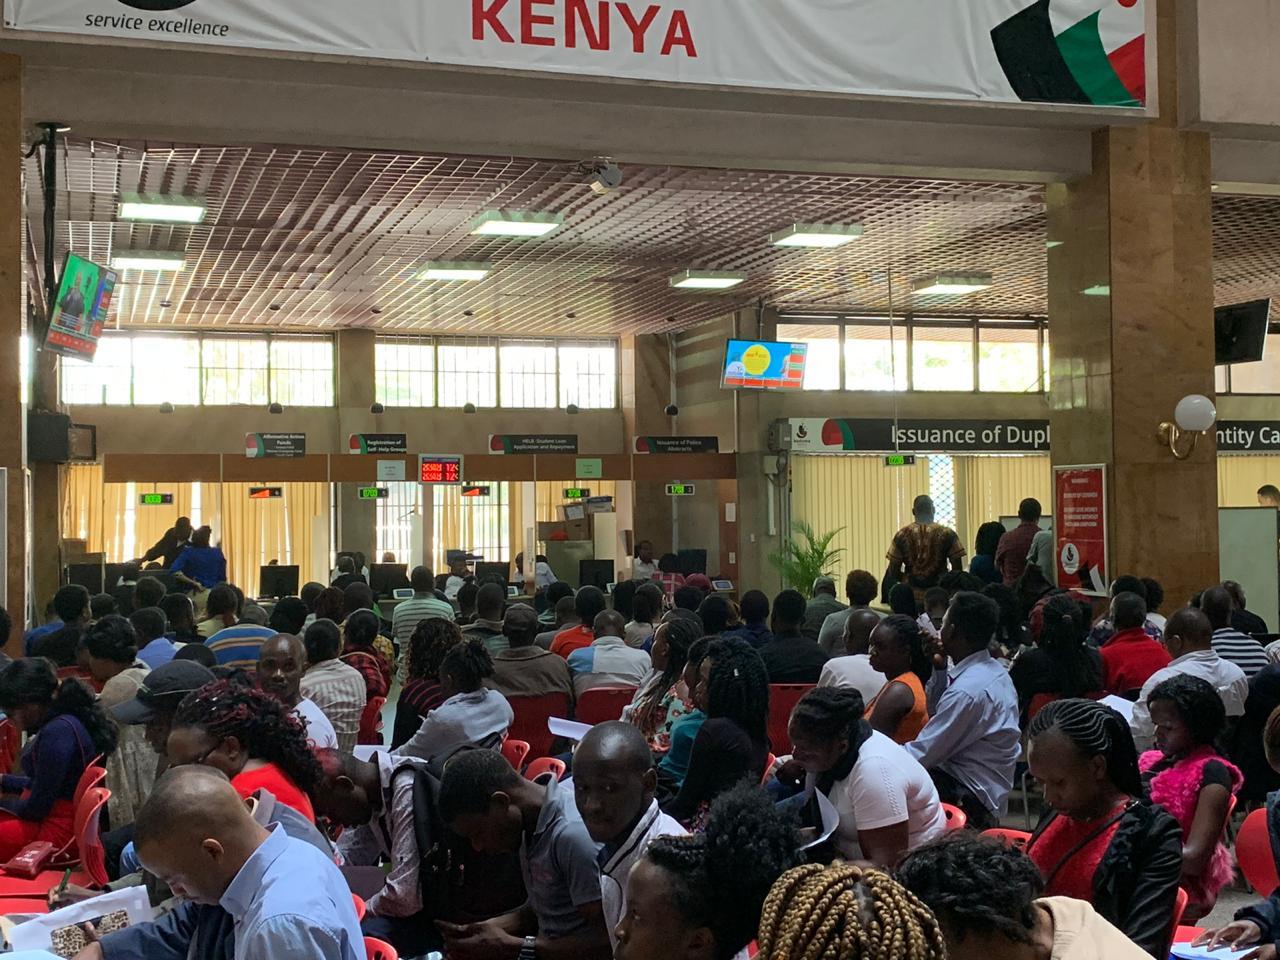 Huduma Kenya Expands Queue Management System Deployment